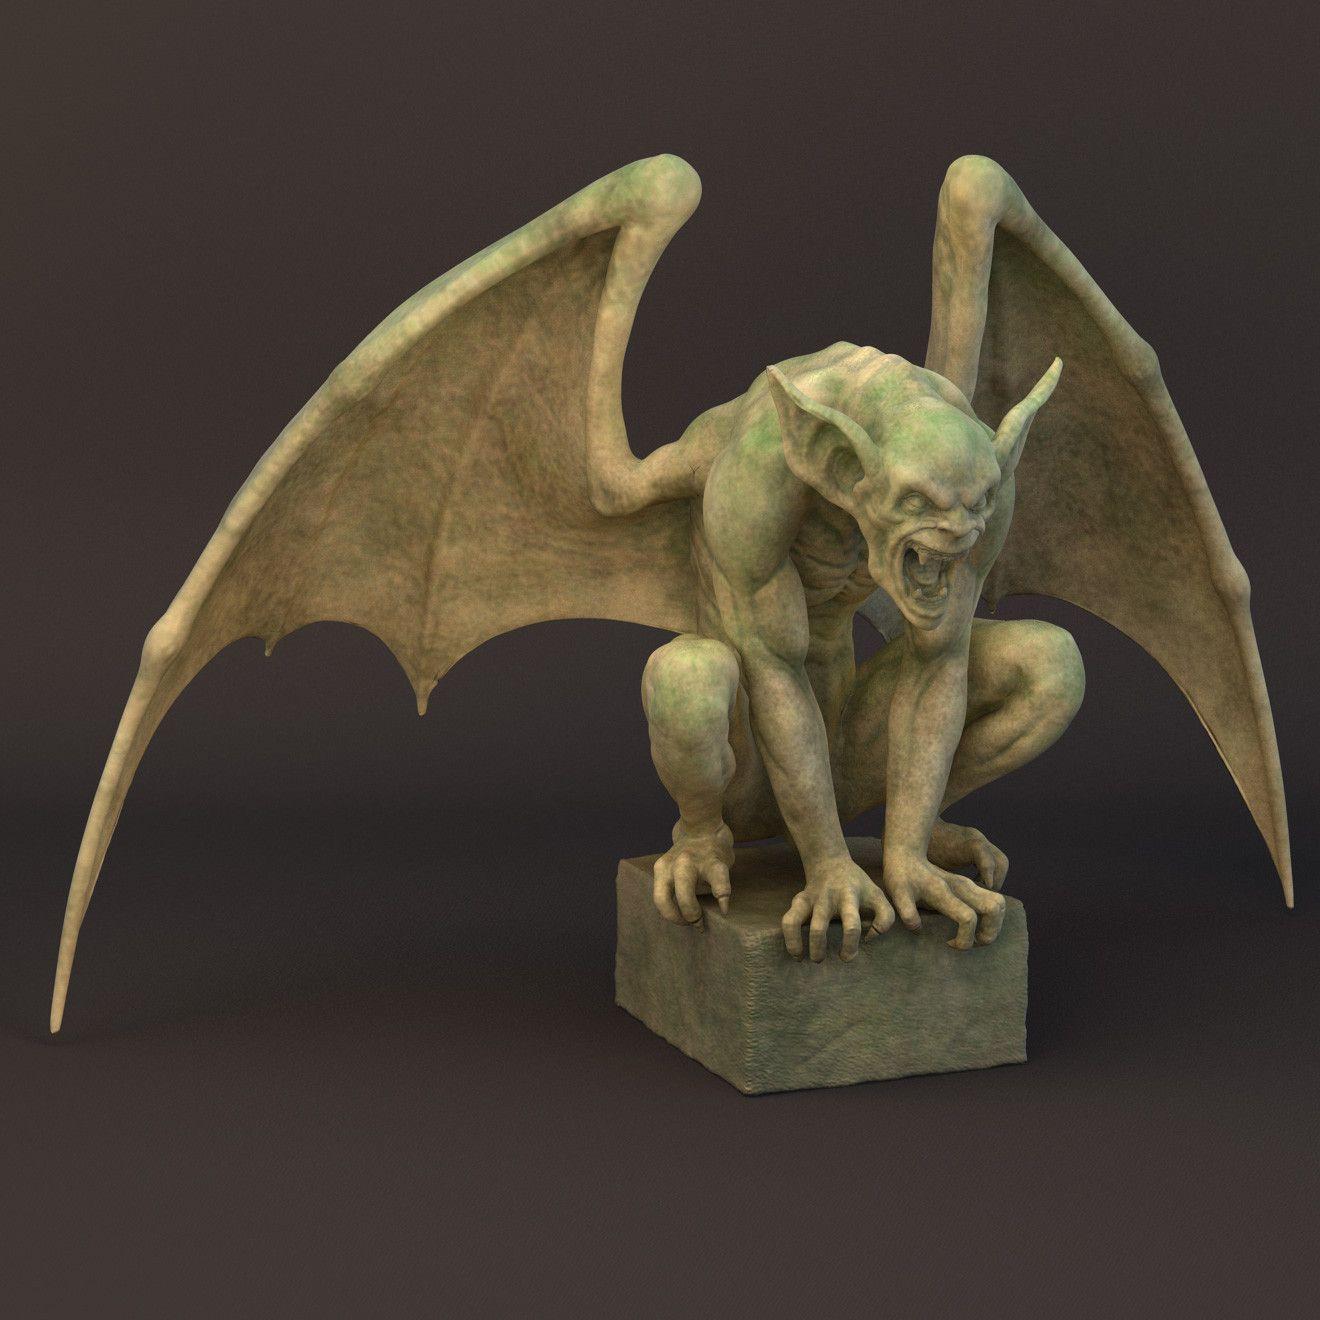 Gargoyle Sculpture 3d Obj Gargoyles In 2019 Pinterest